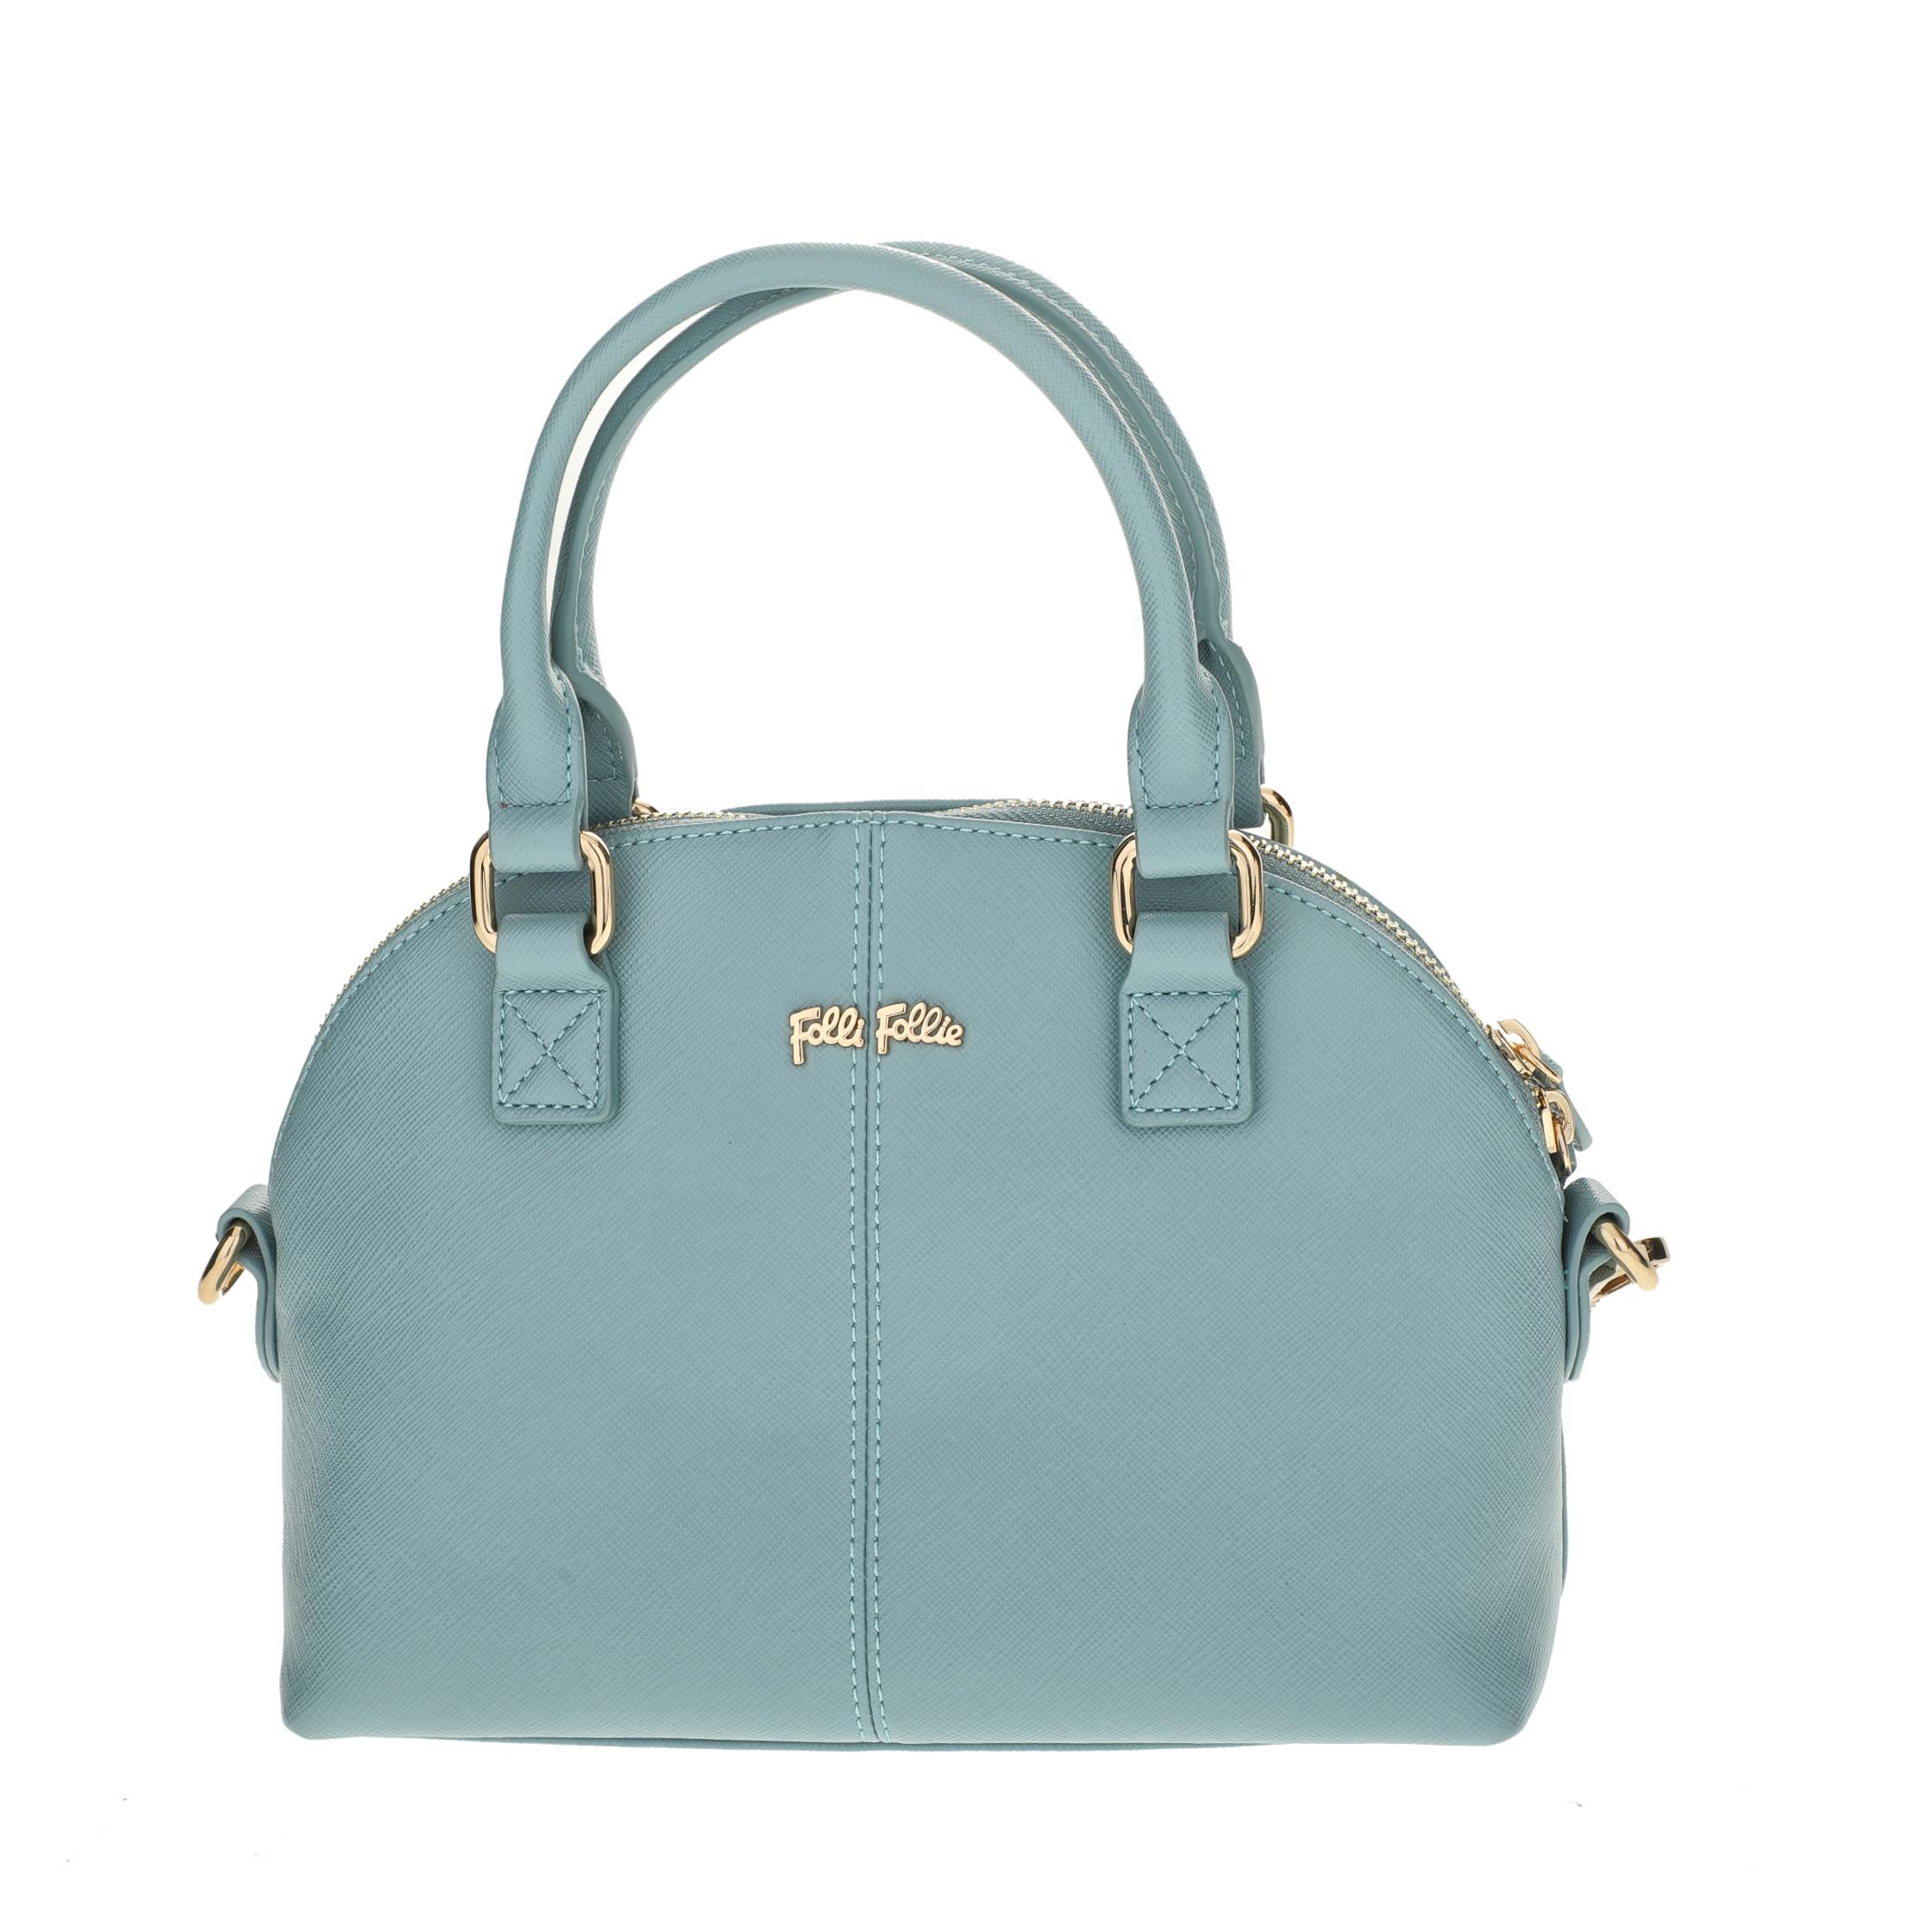 FOLLI FOLLIE - Γυναικεία μικρή τσάντα χειρός Folli Follie γαλάζια γυναικεία αξεσουάρ τσάντες σακίδια χειρός